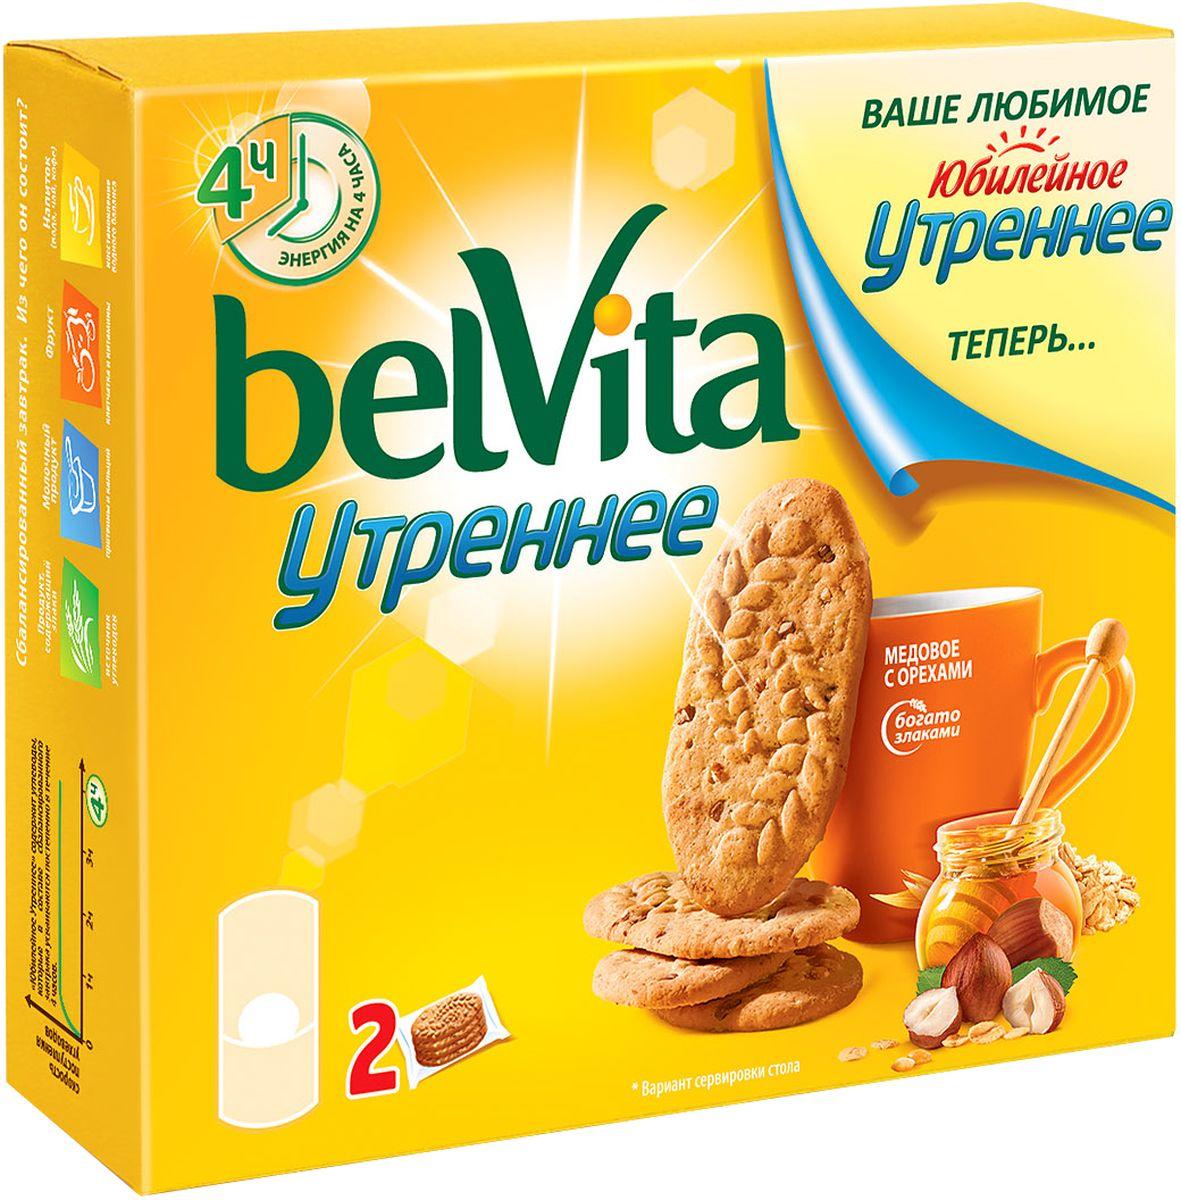 BelVita Печенье